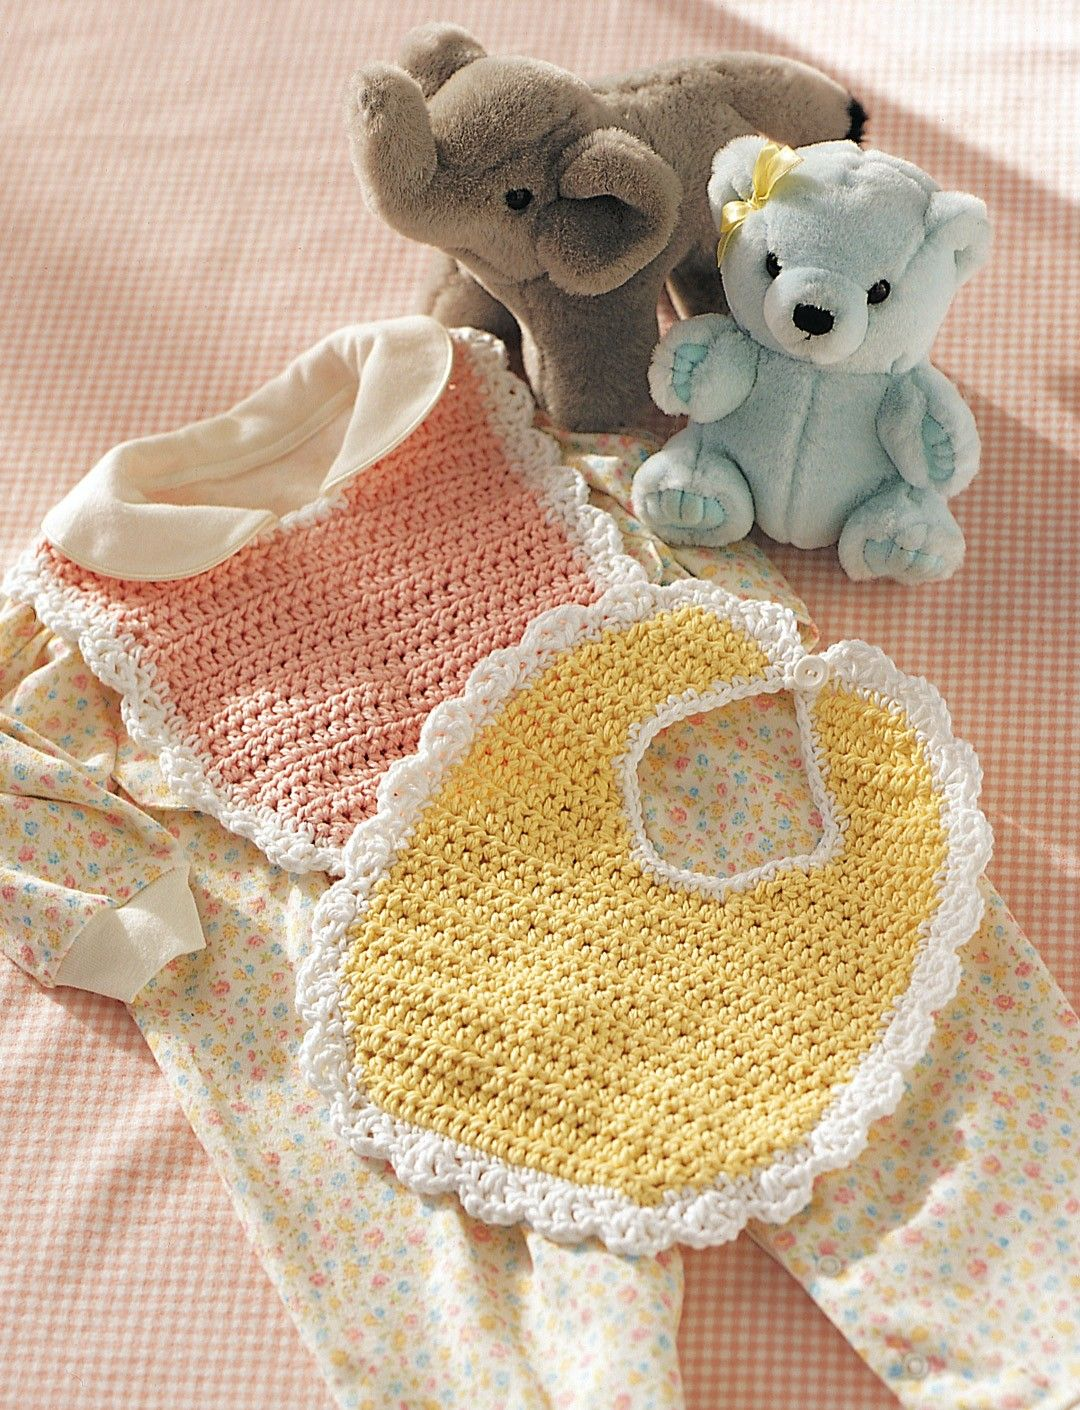 Baby bib free crochet pattern yarnspirations baby crochet baby bib free crochet pattern yarnspirations bankloansurffo Image collections